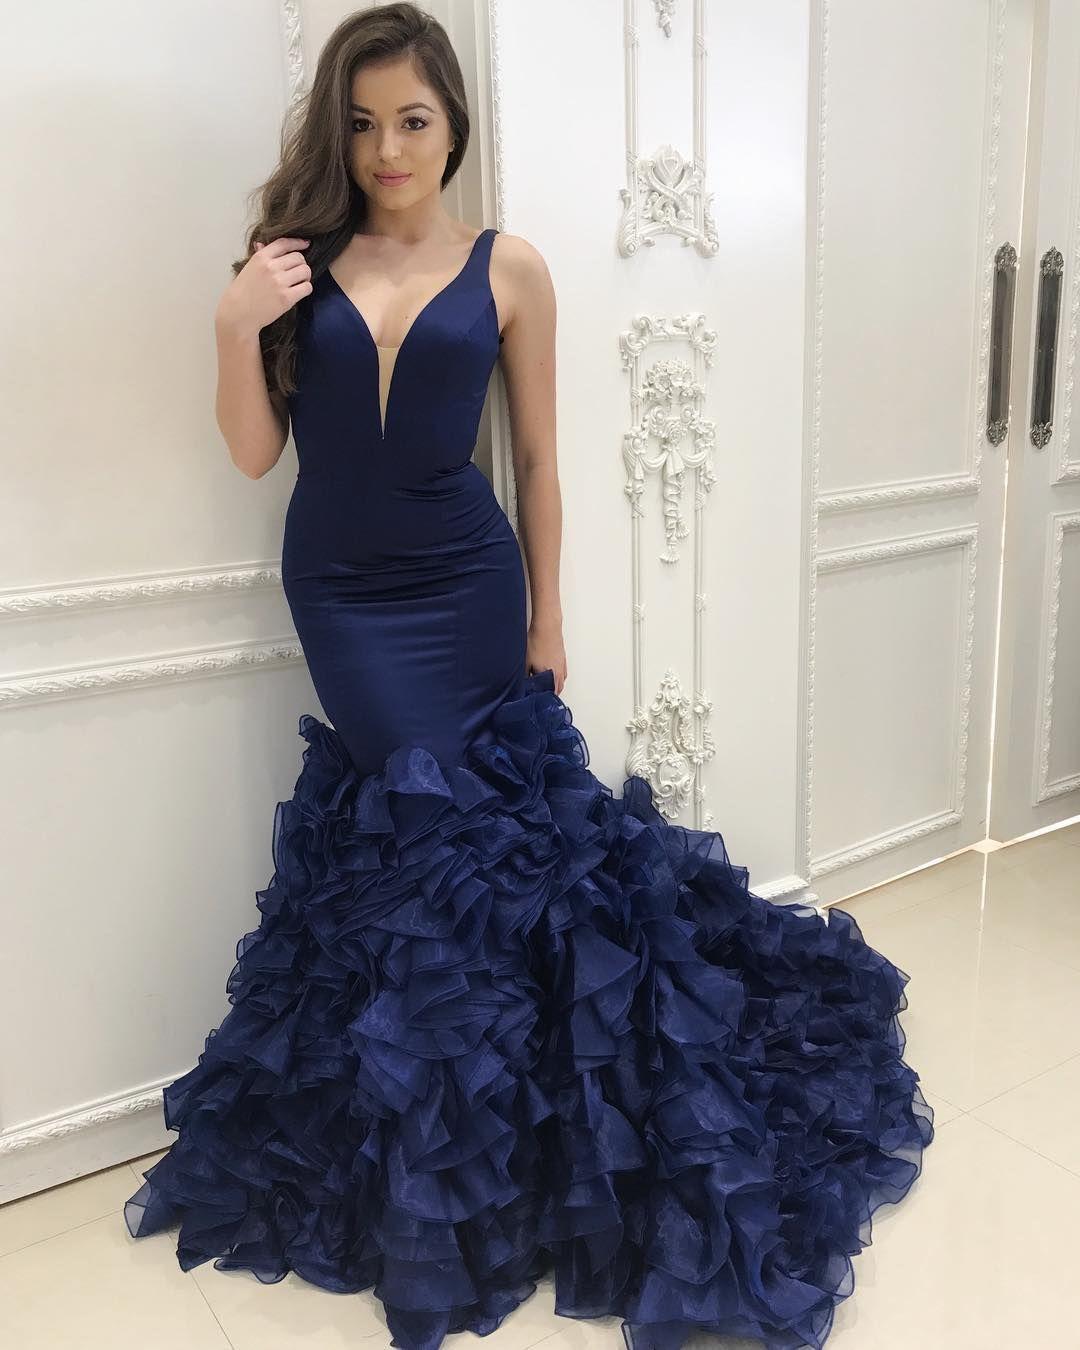 Navy blue mermaid evening dresses v neck sleeveless organza